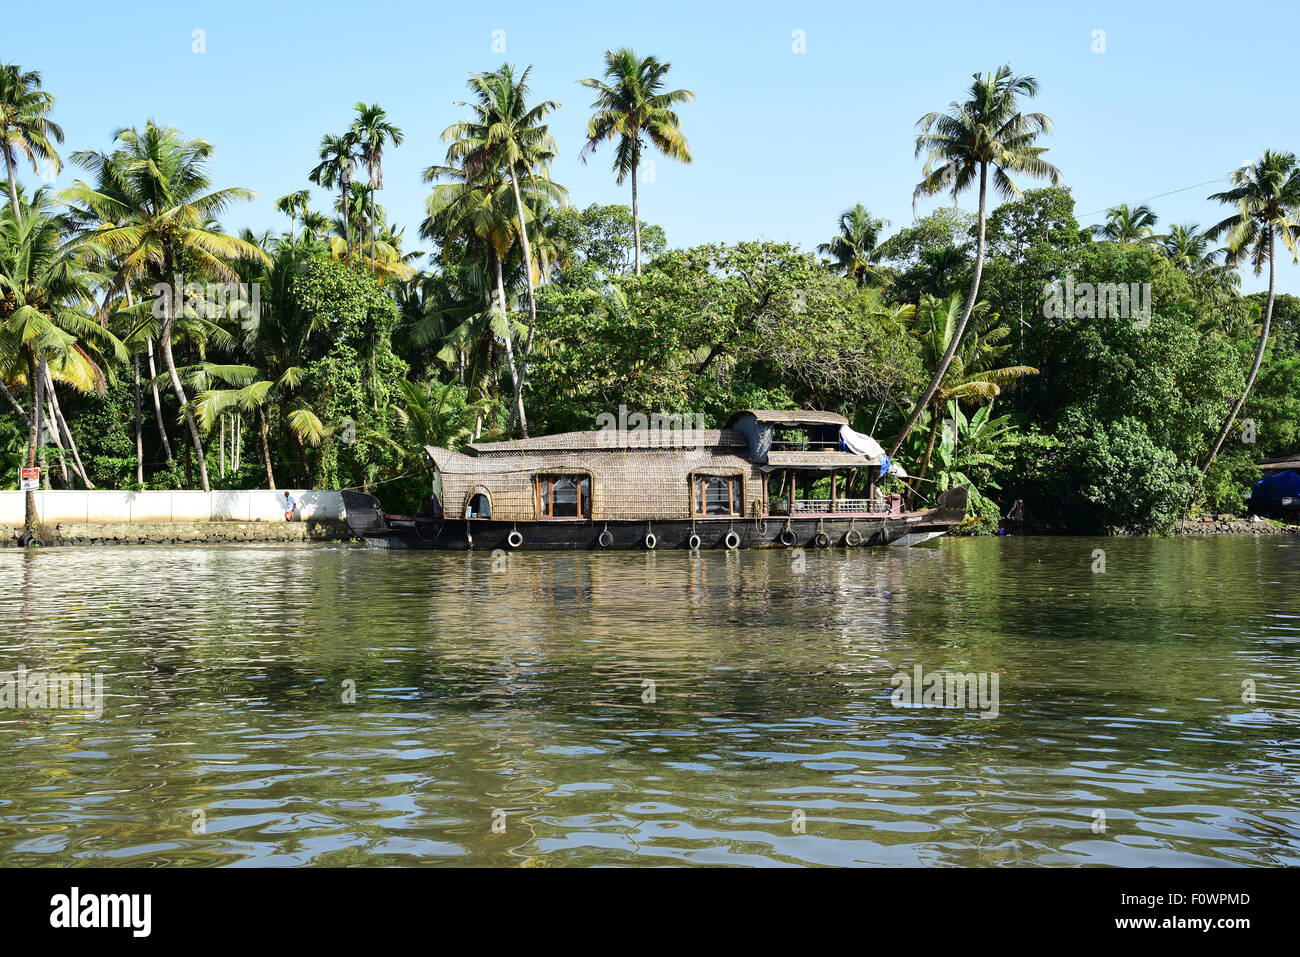 Anspruchsvoll Conhouse Galerie Von Paisaje De Remansos De Kerala Con E